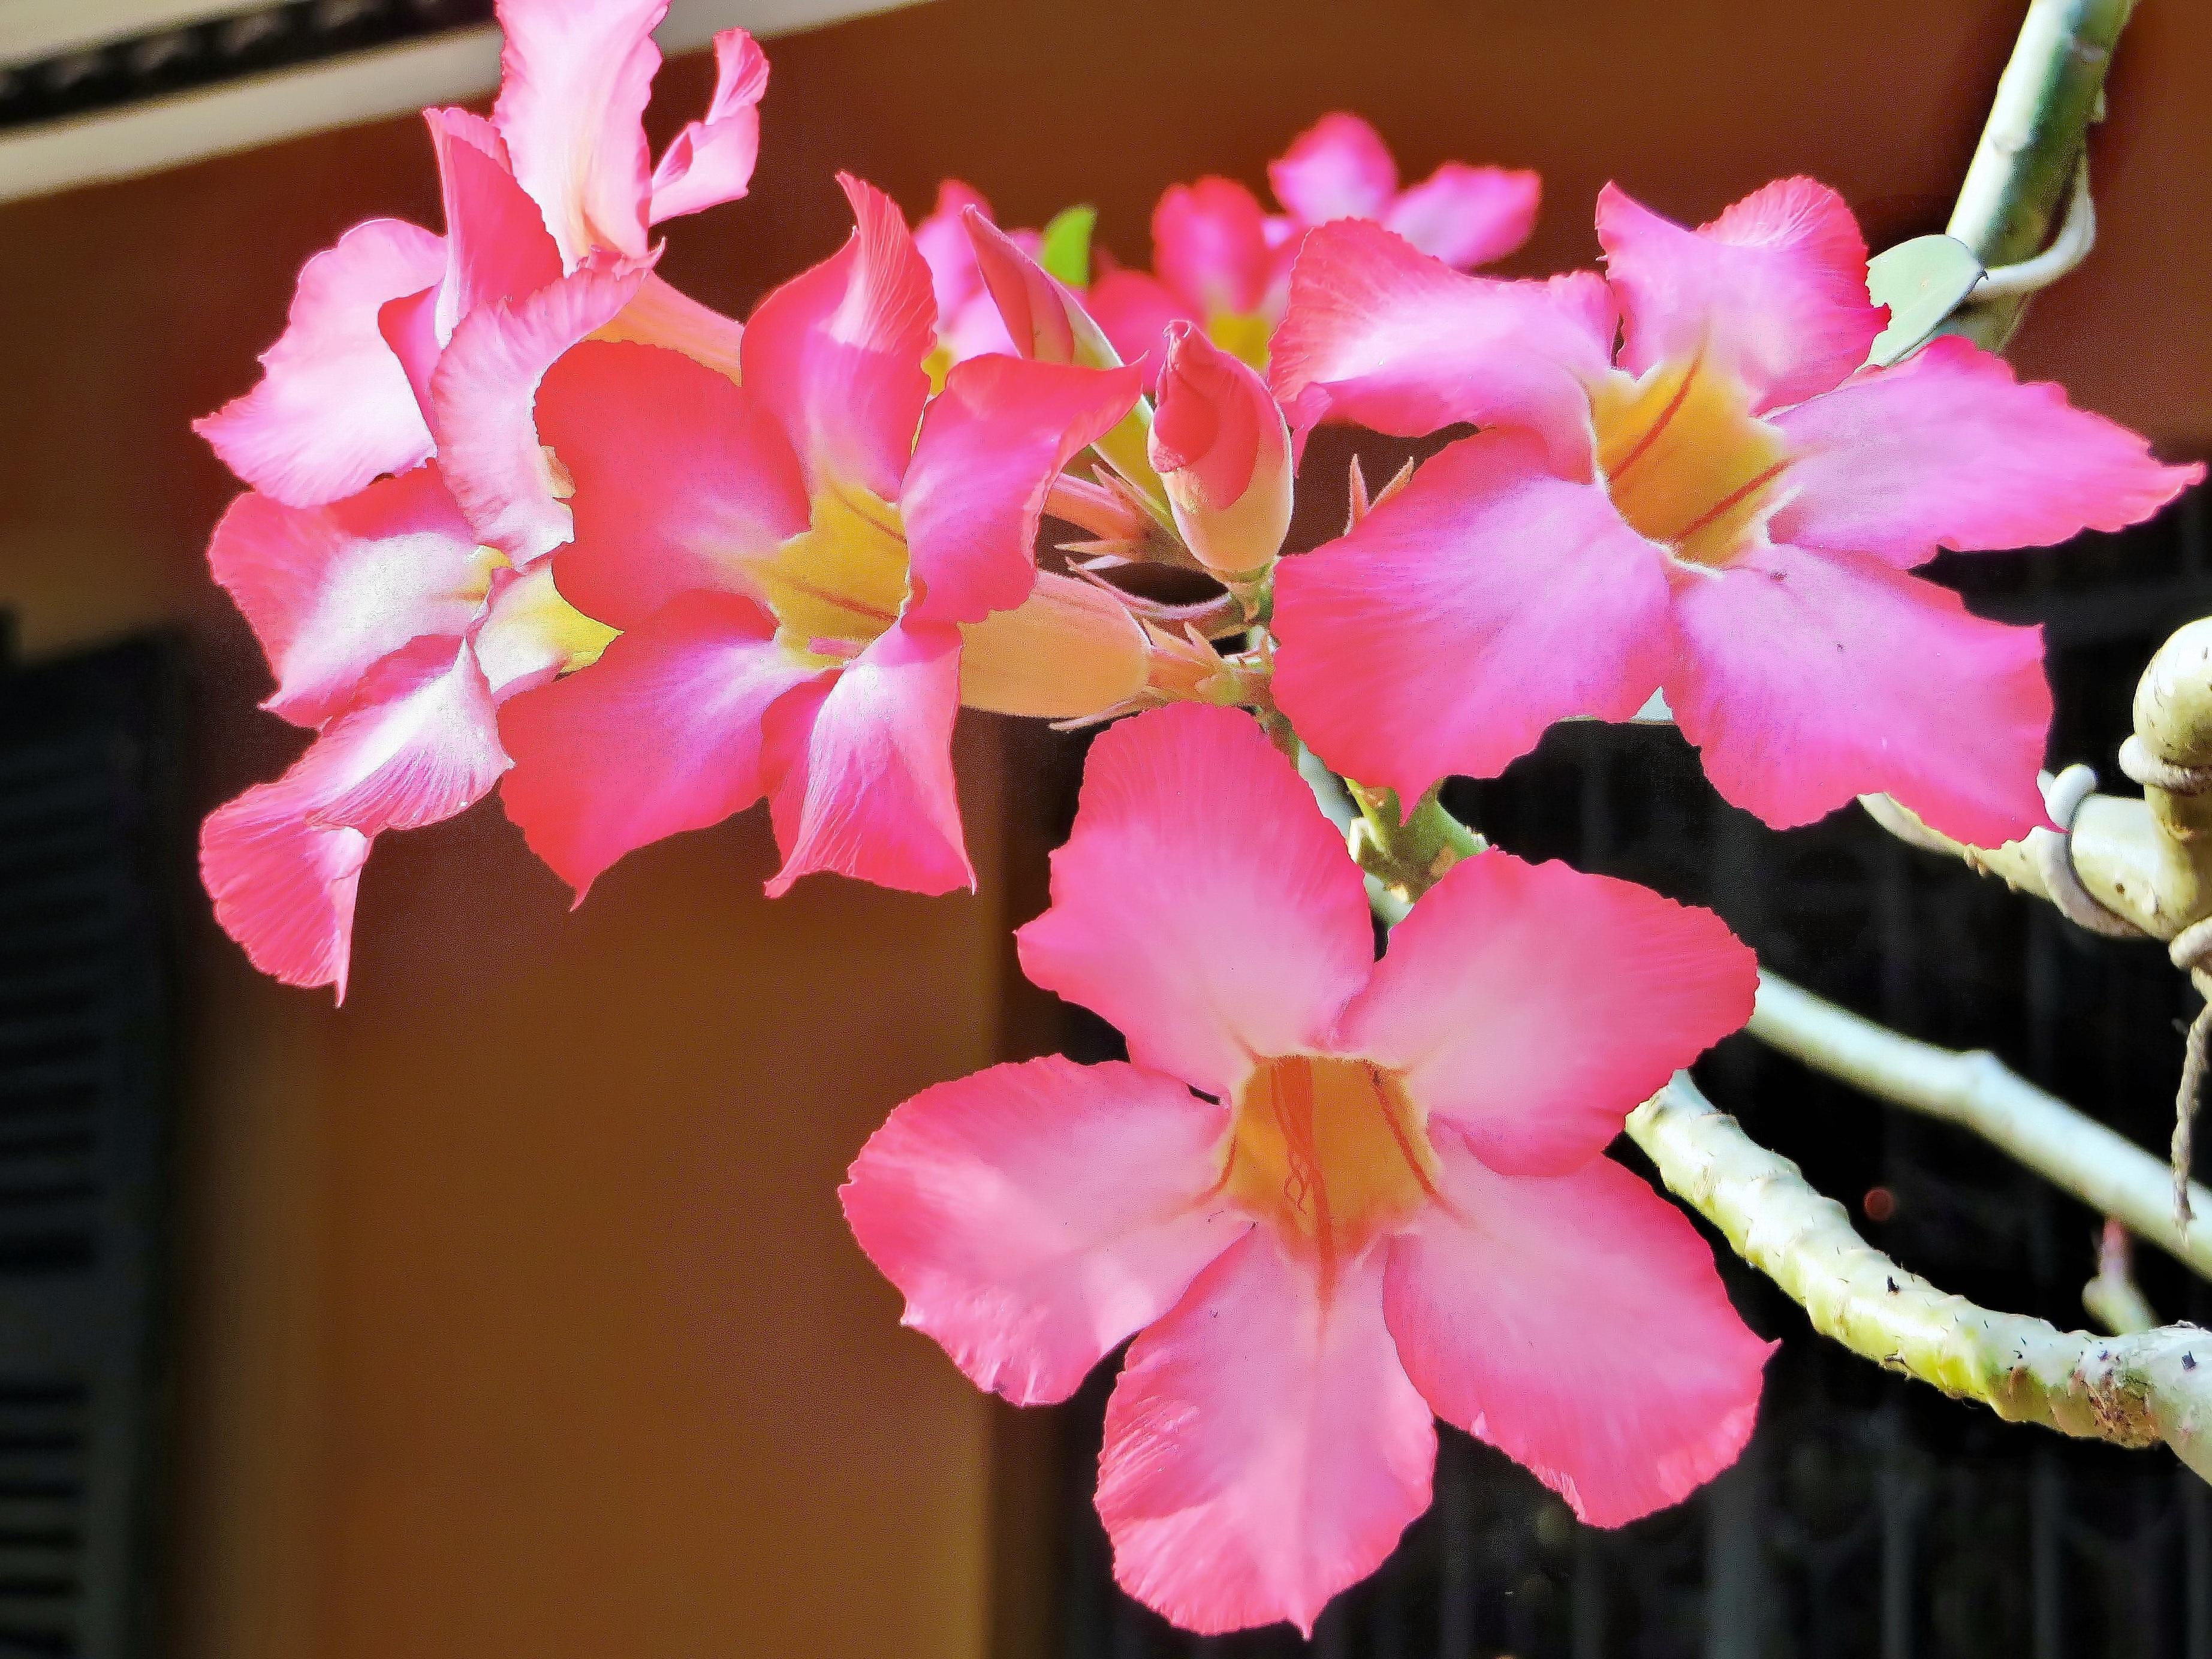 Free Images Nature Blossom Light Petal Botany Flora Flowers